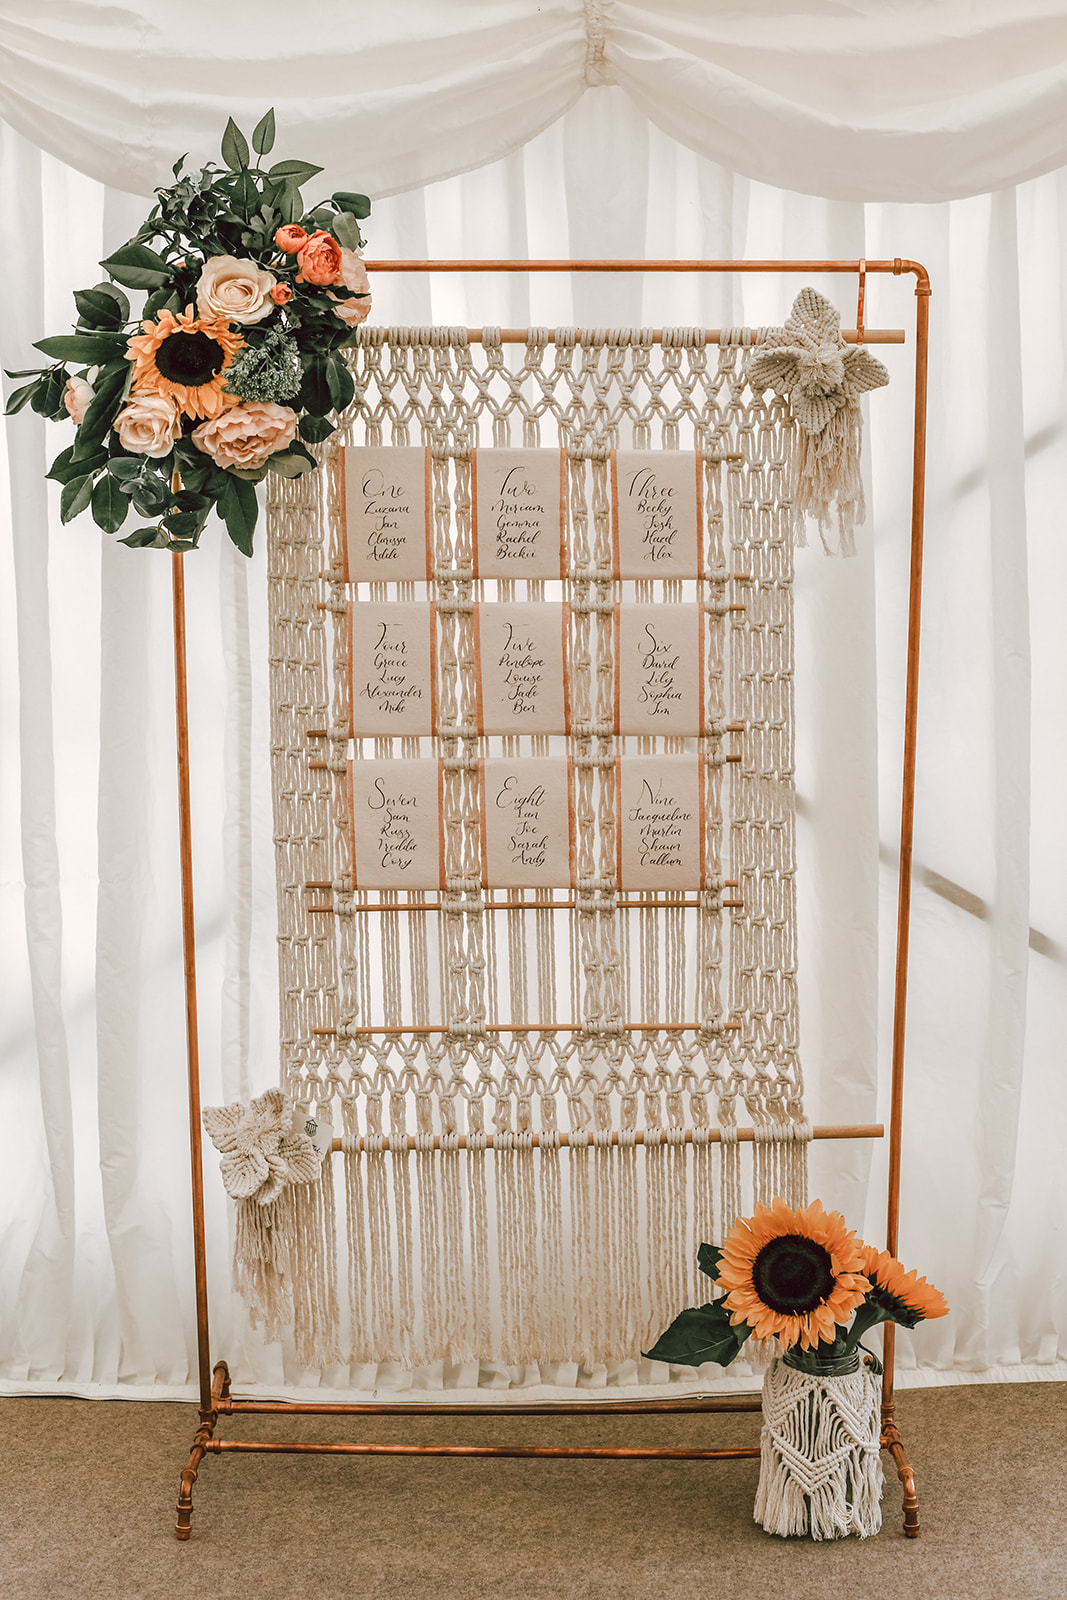 rustic festival wedding - macrame wedding seating plan - sunflower wedding - unique wedding stationery - boho wedding seating plan